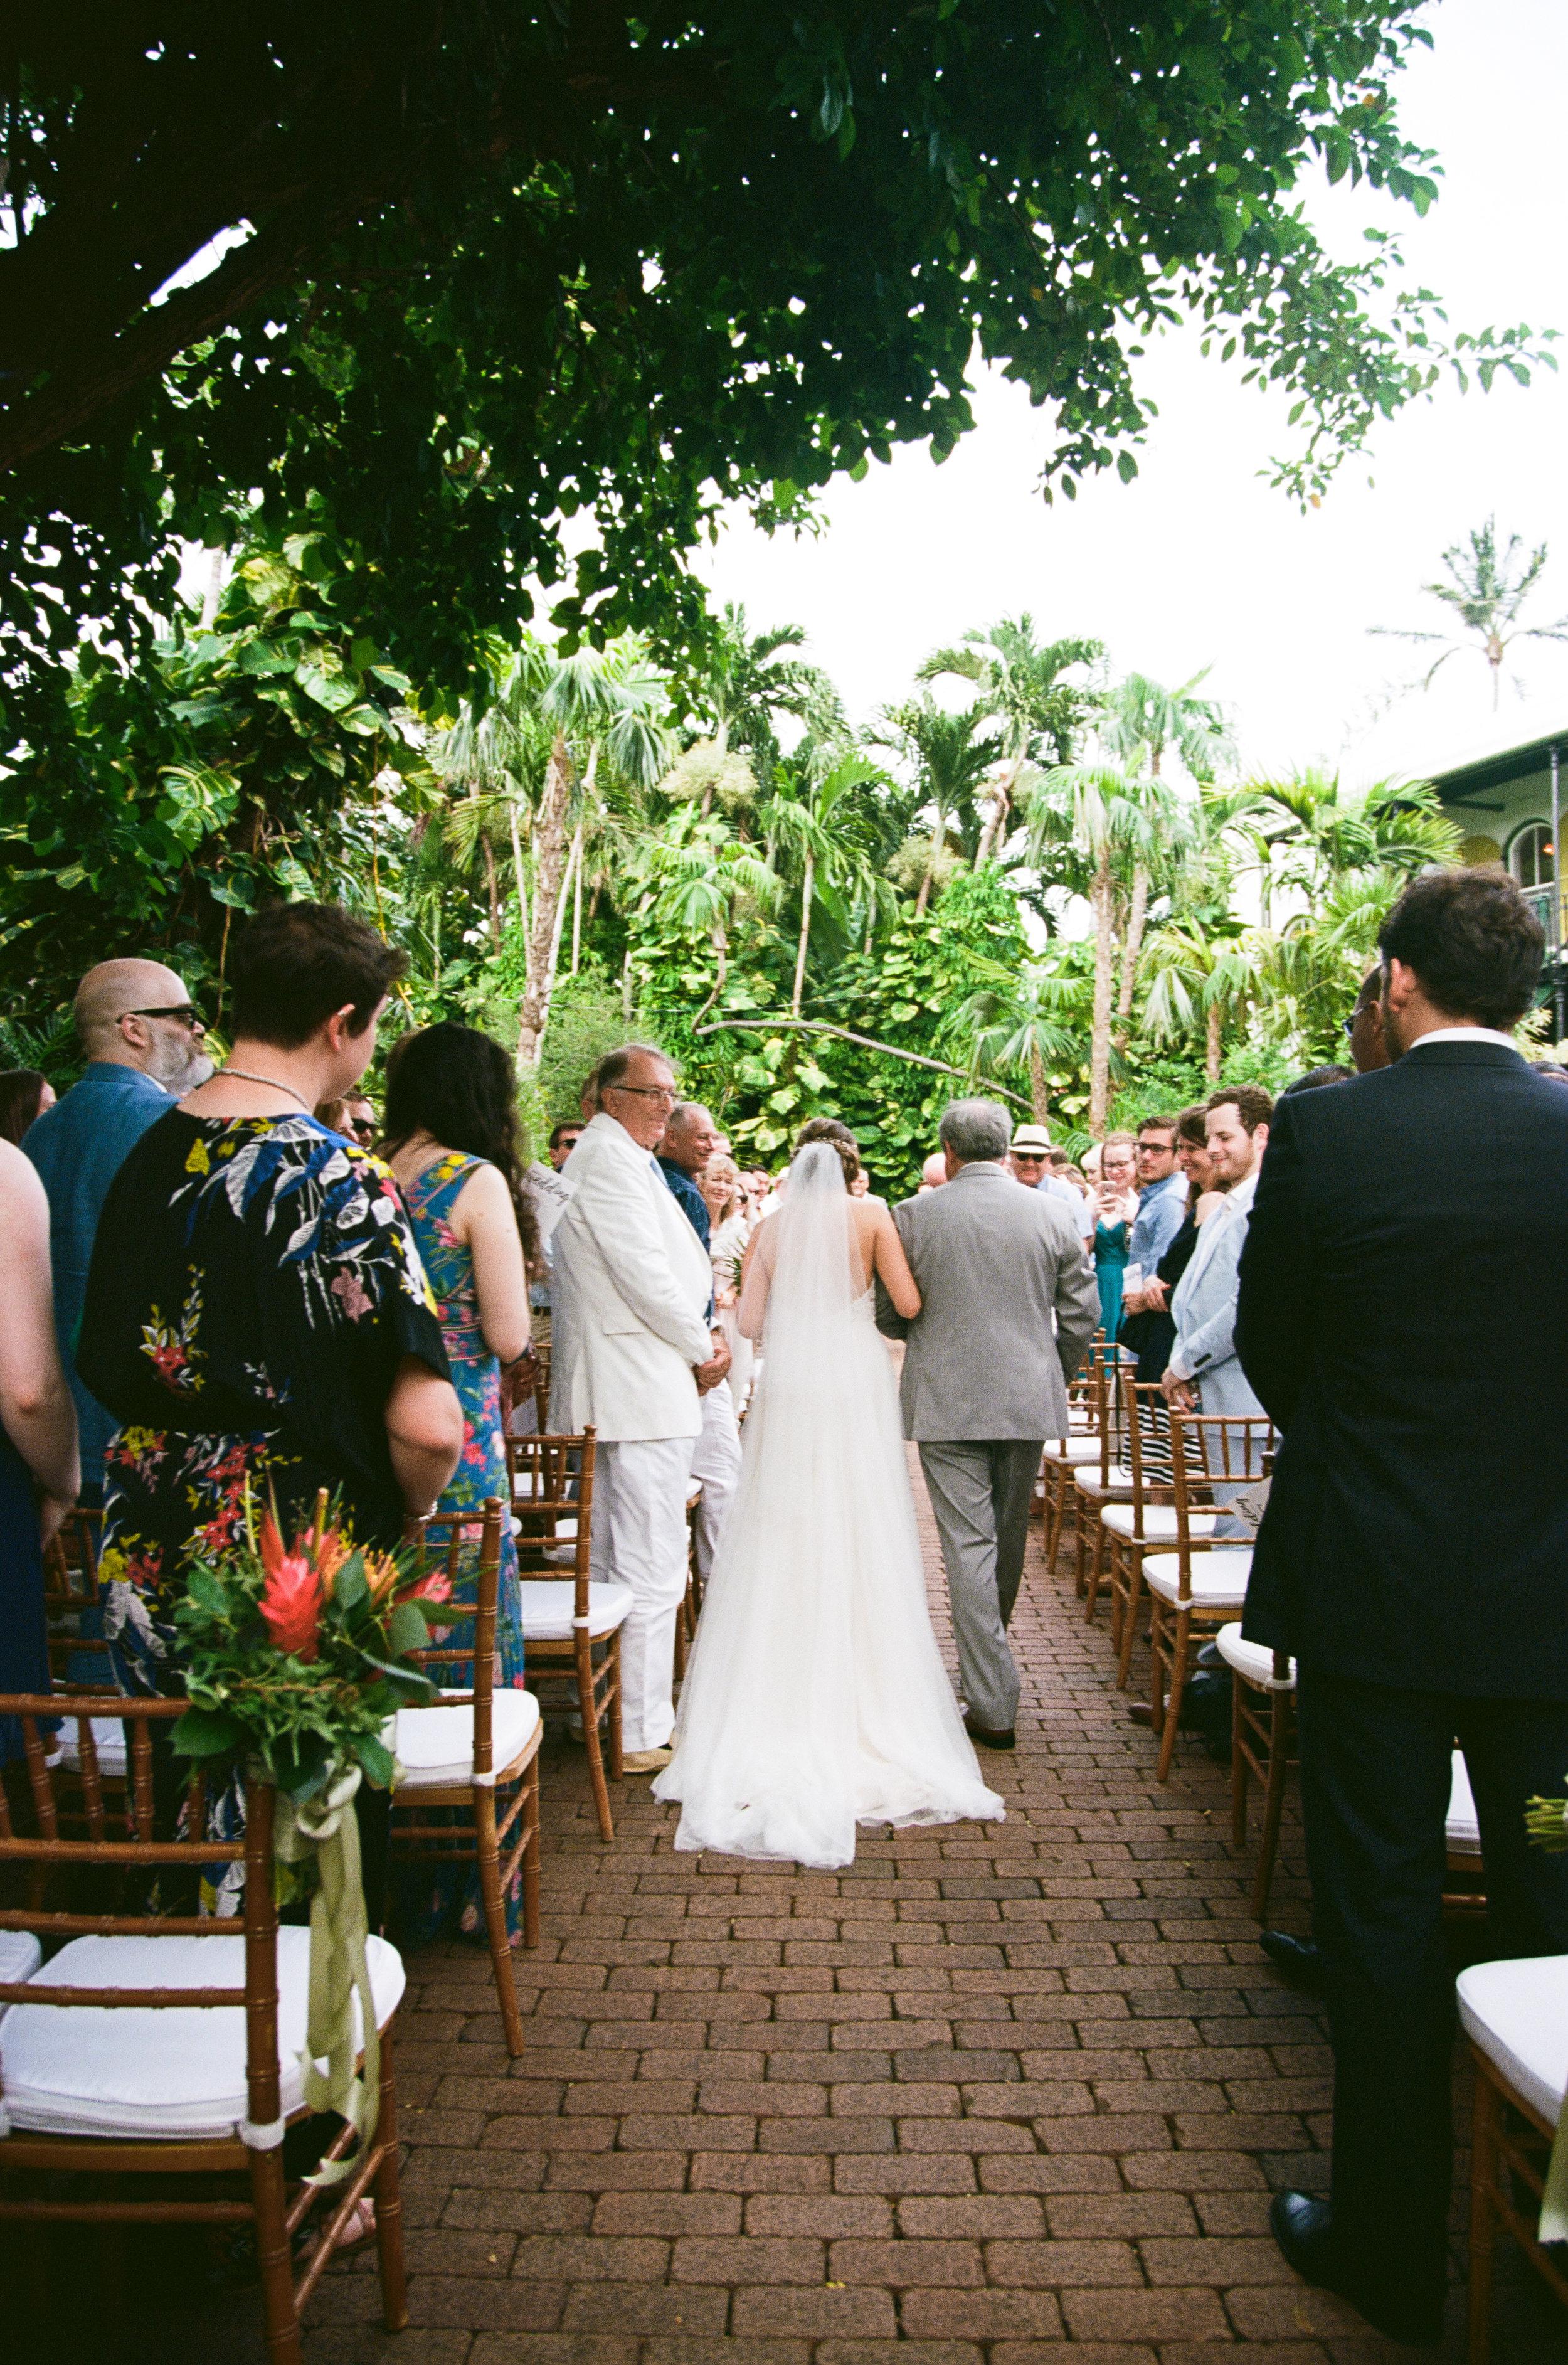 dad-walks-phoebe-down-aisle-ernest-hemingway-wedding